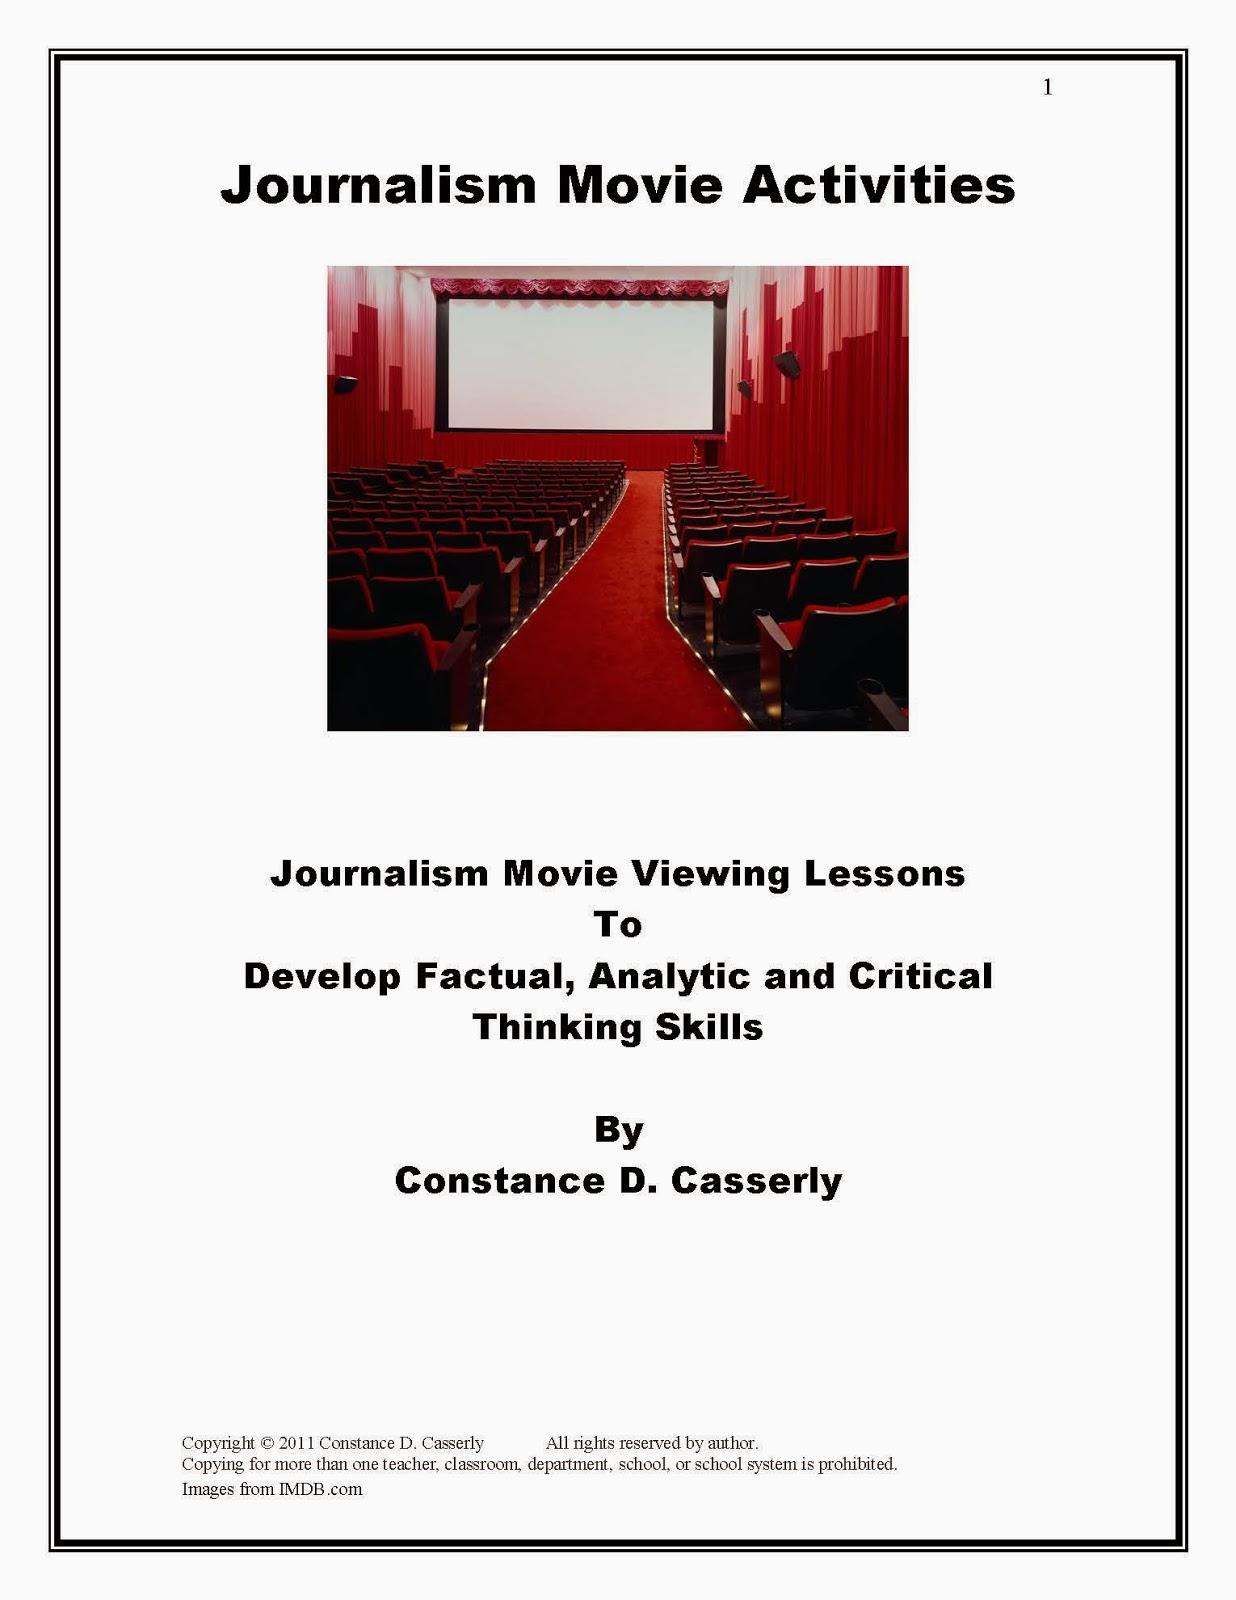 Journalism Movie Activities cover